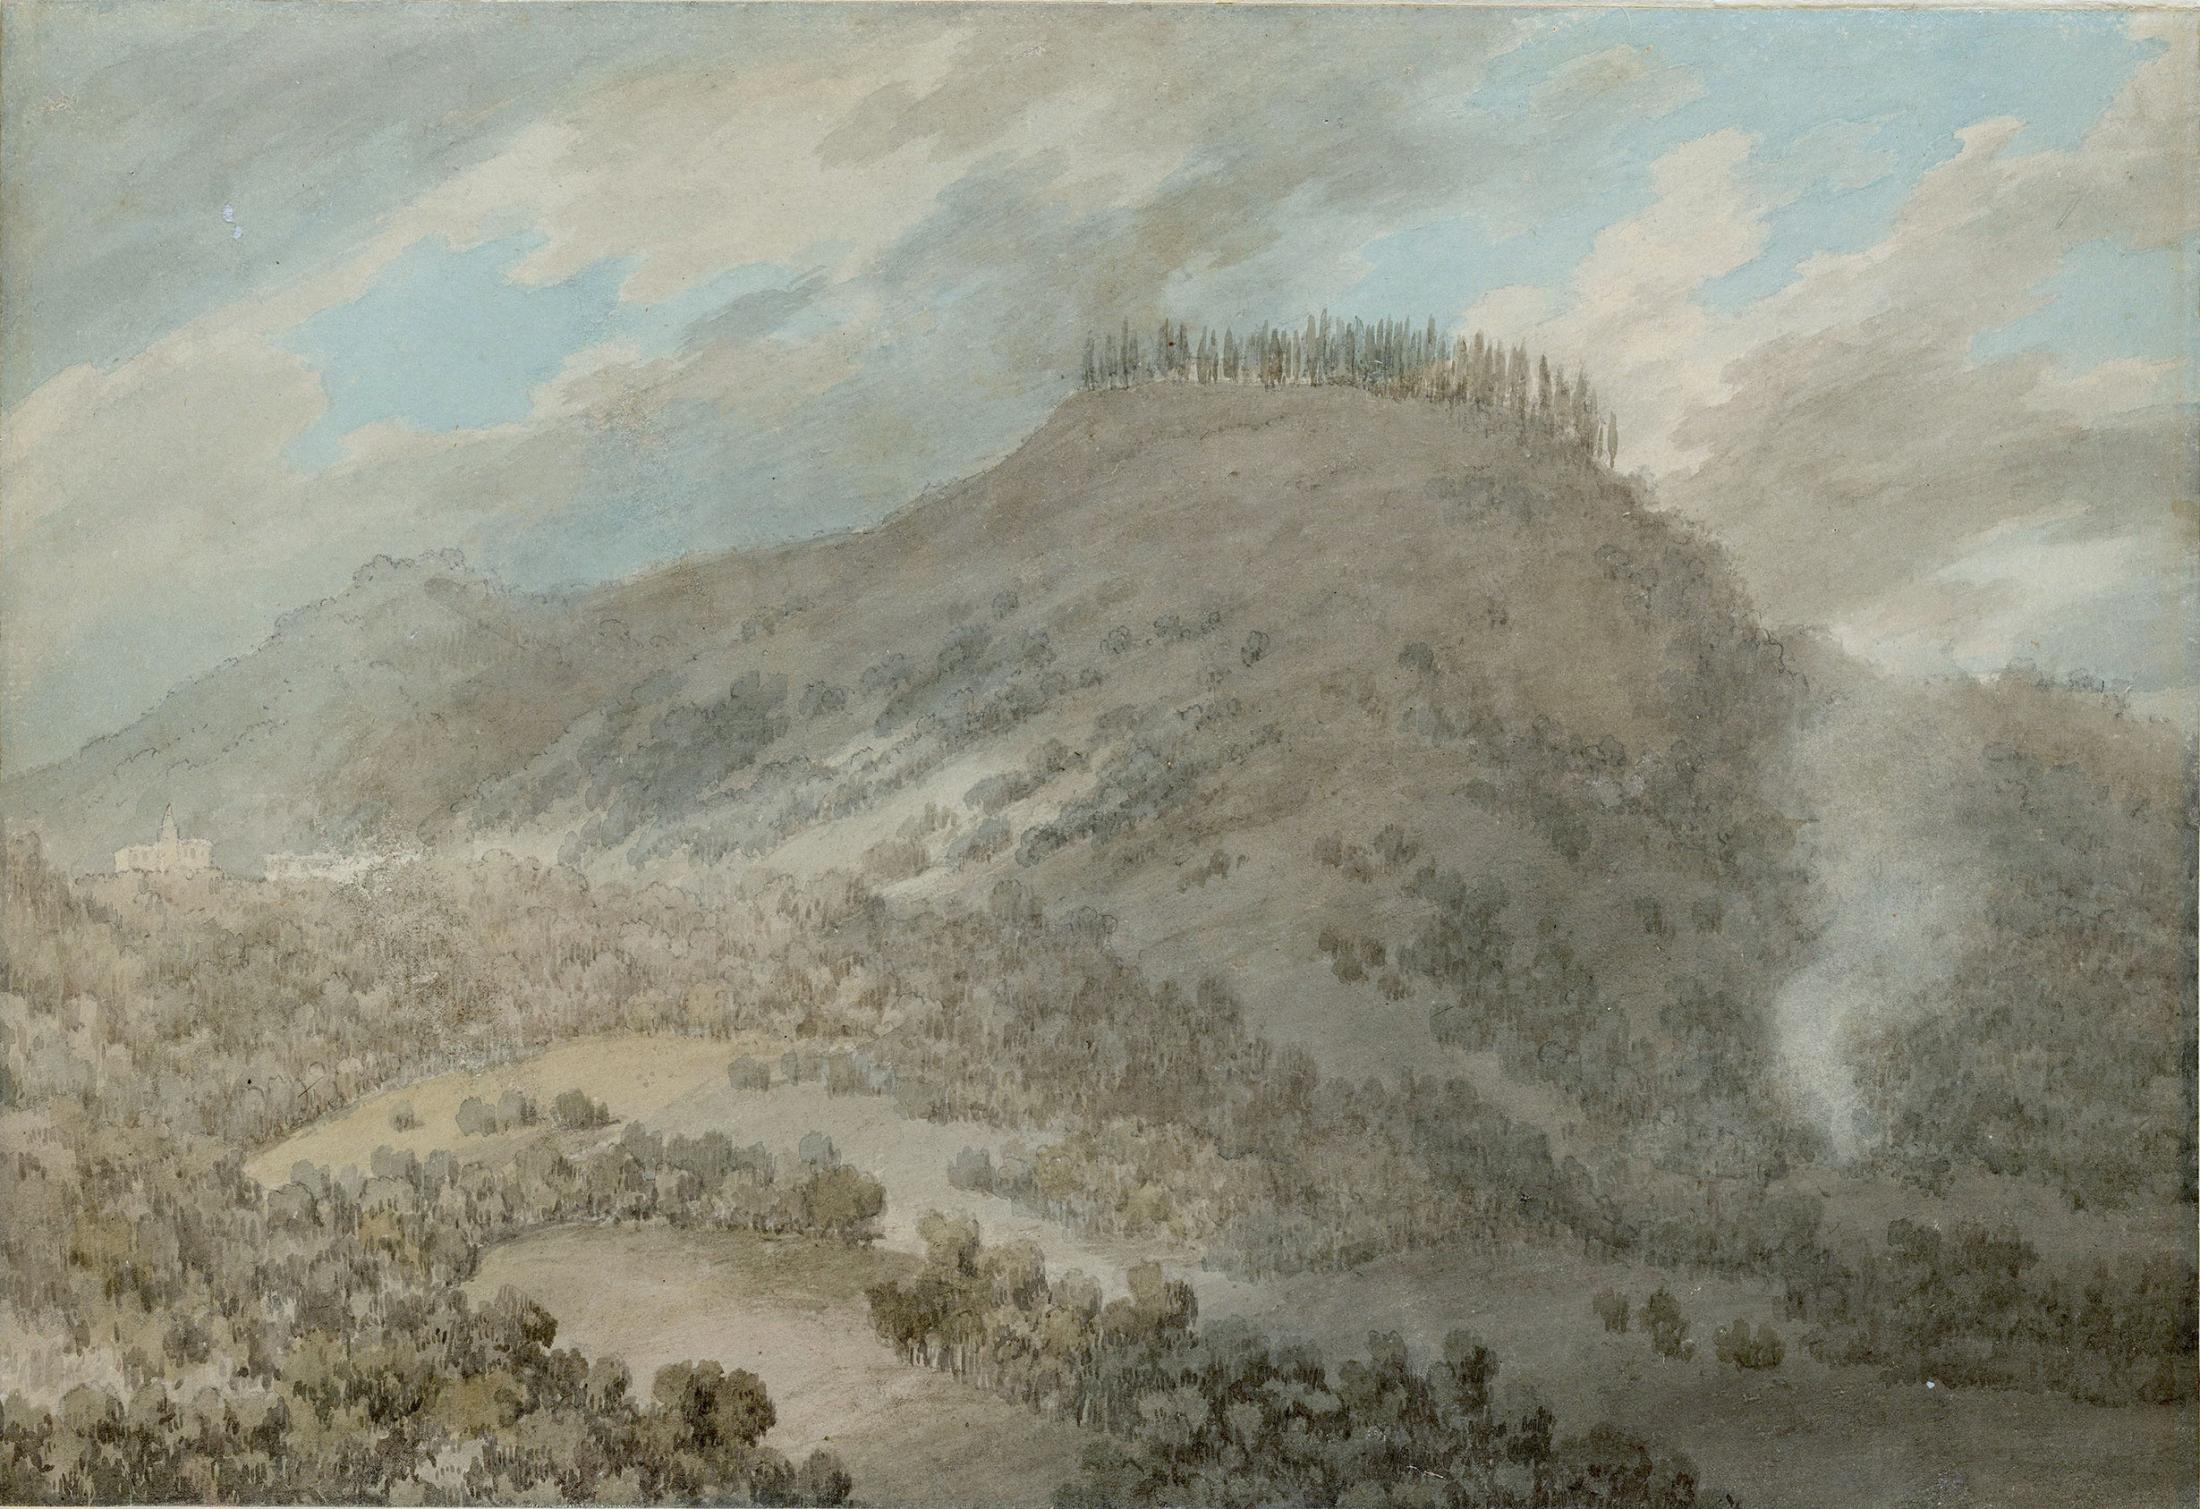 View from Mirabella in the Euganean Hills near Padua